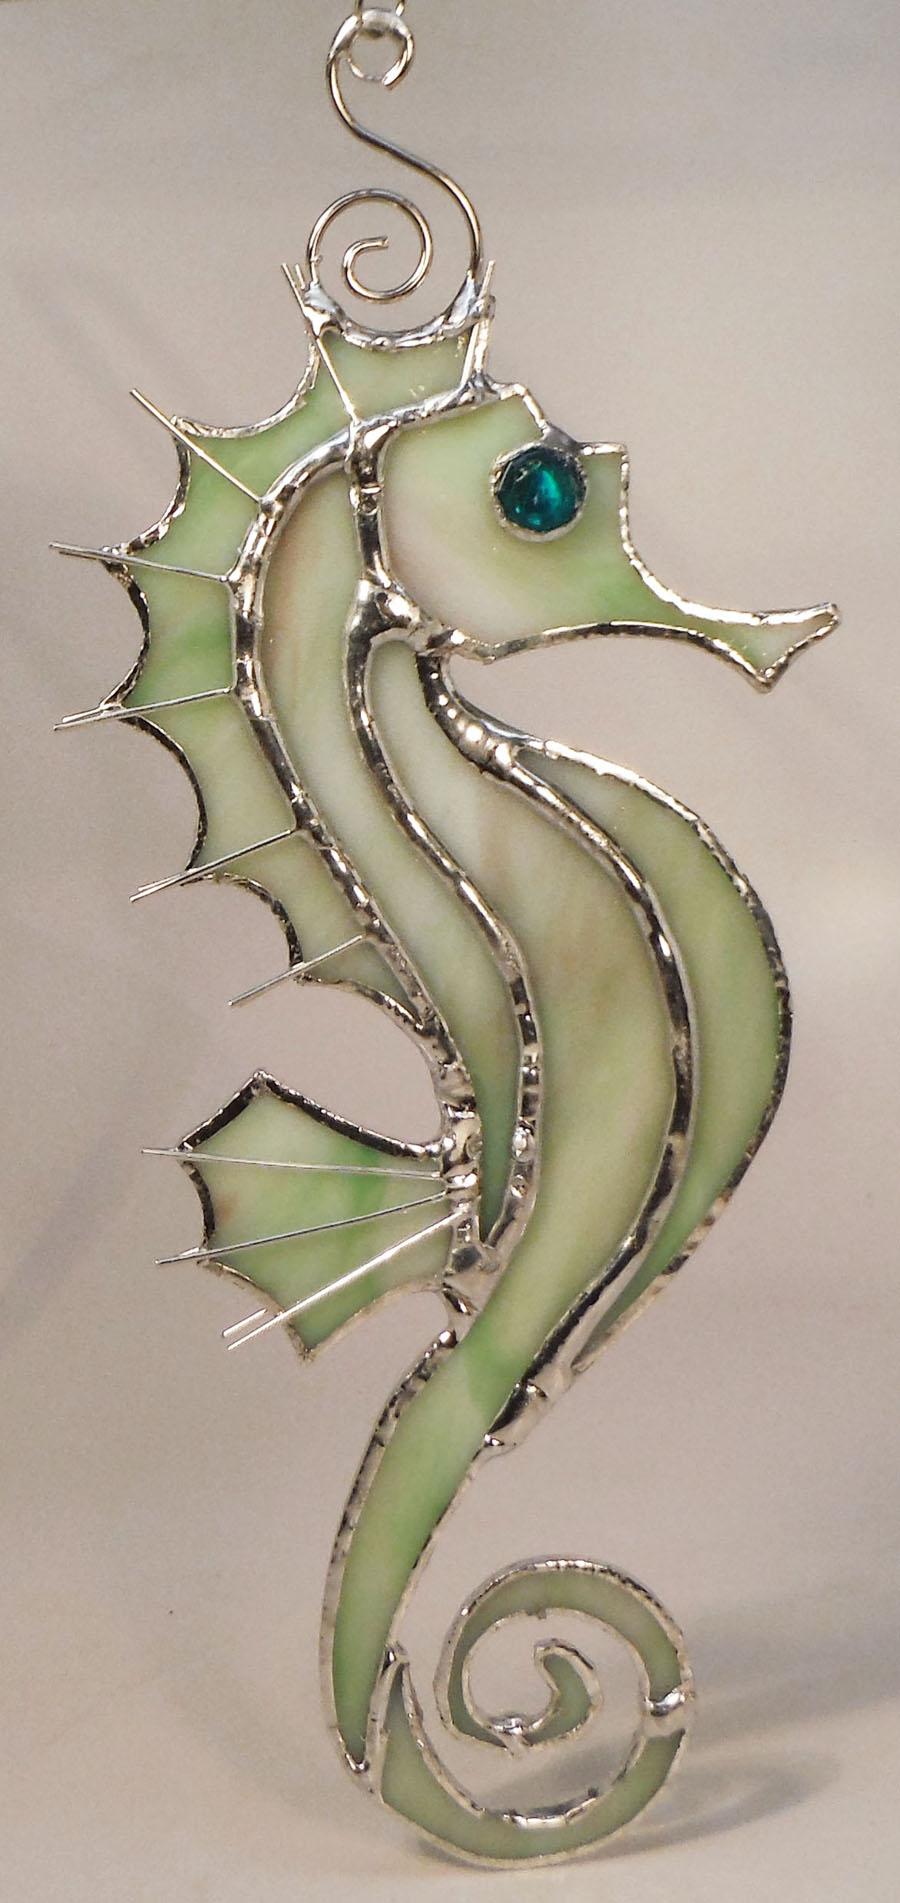 Seahorse08small